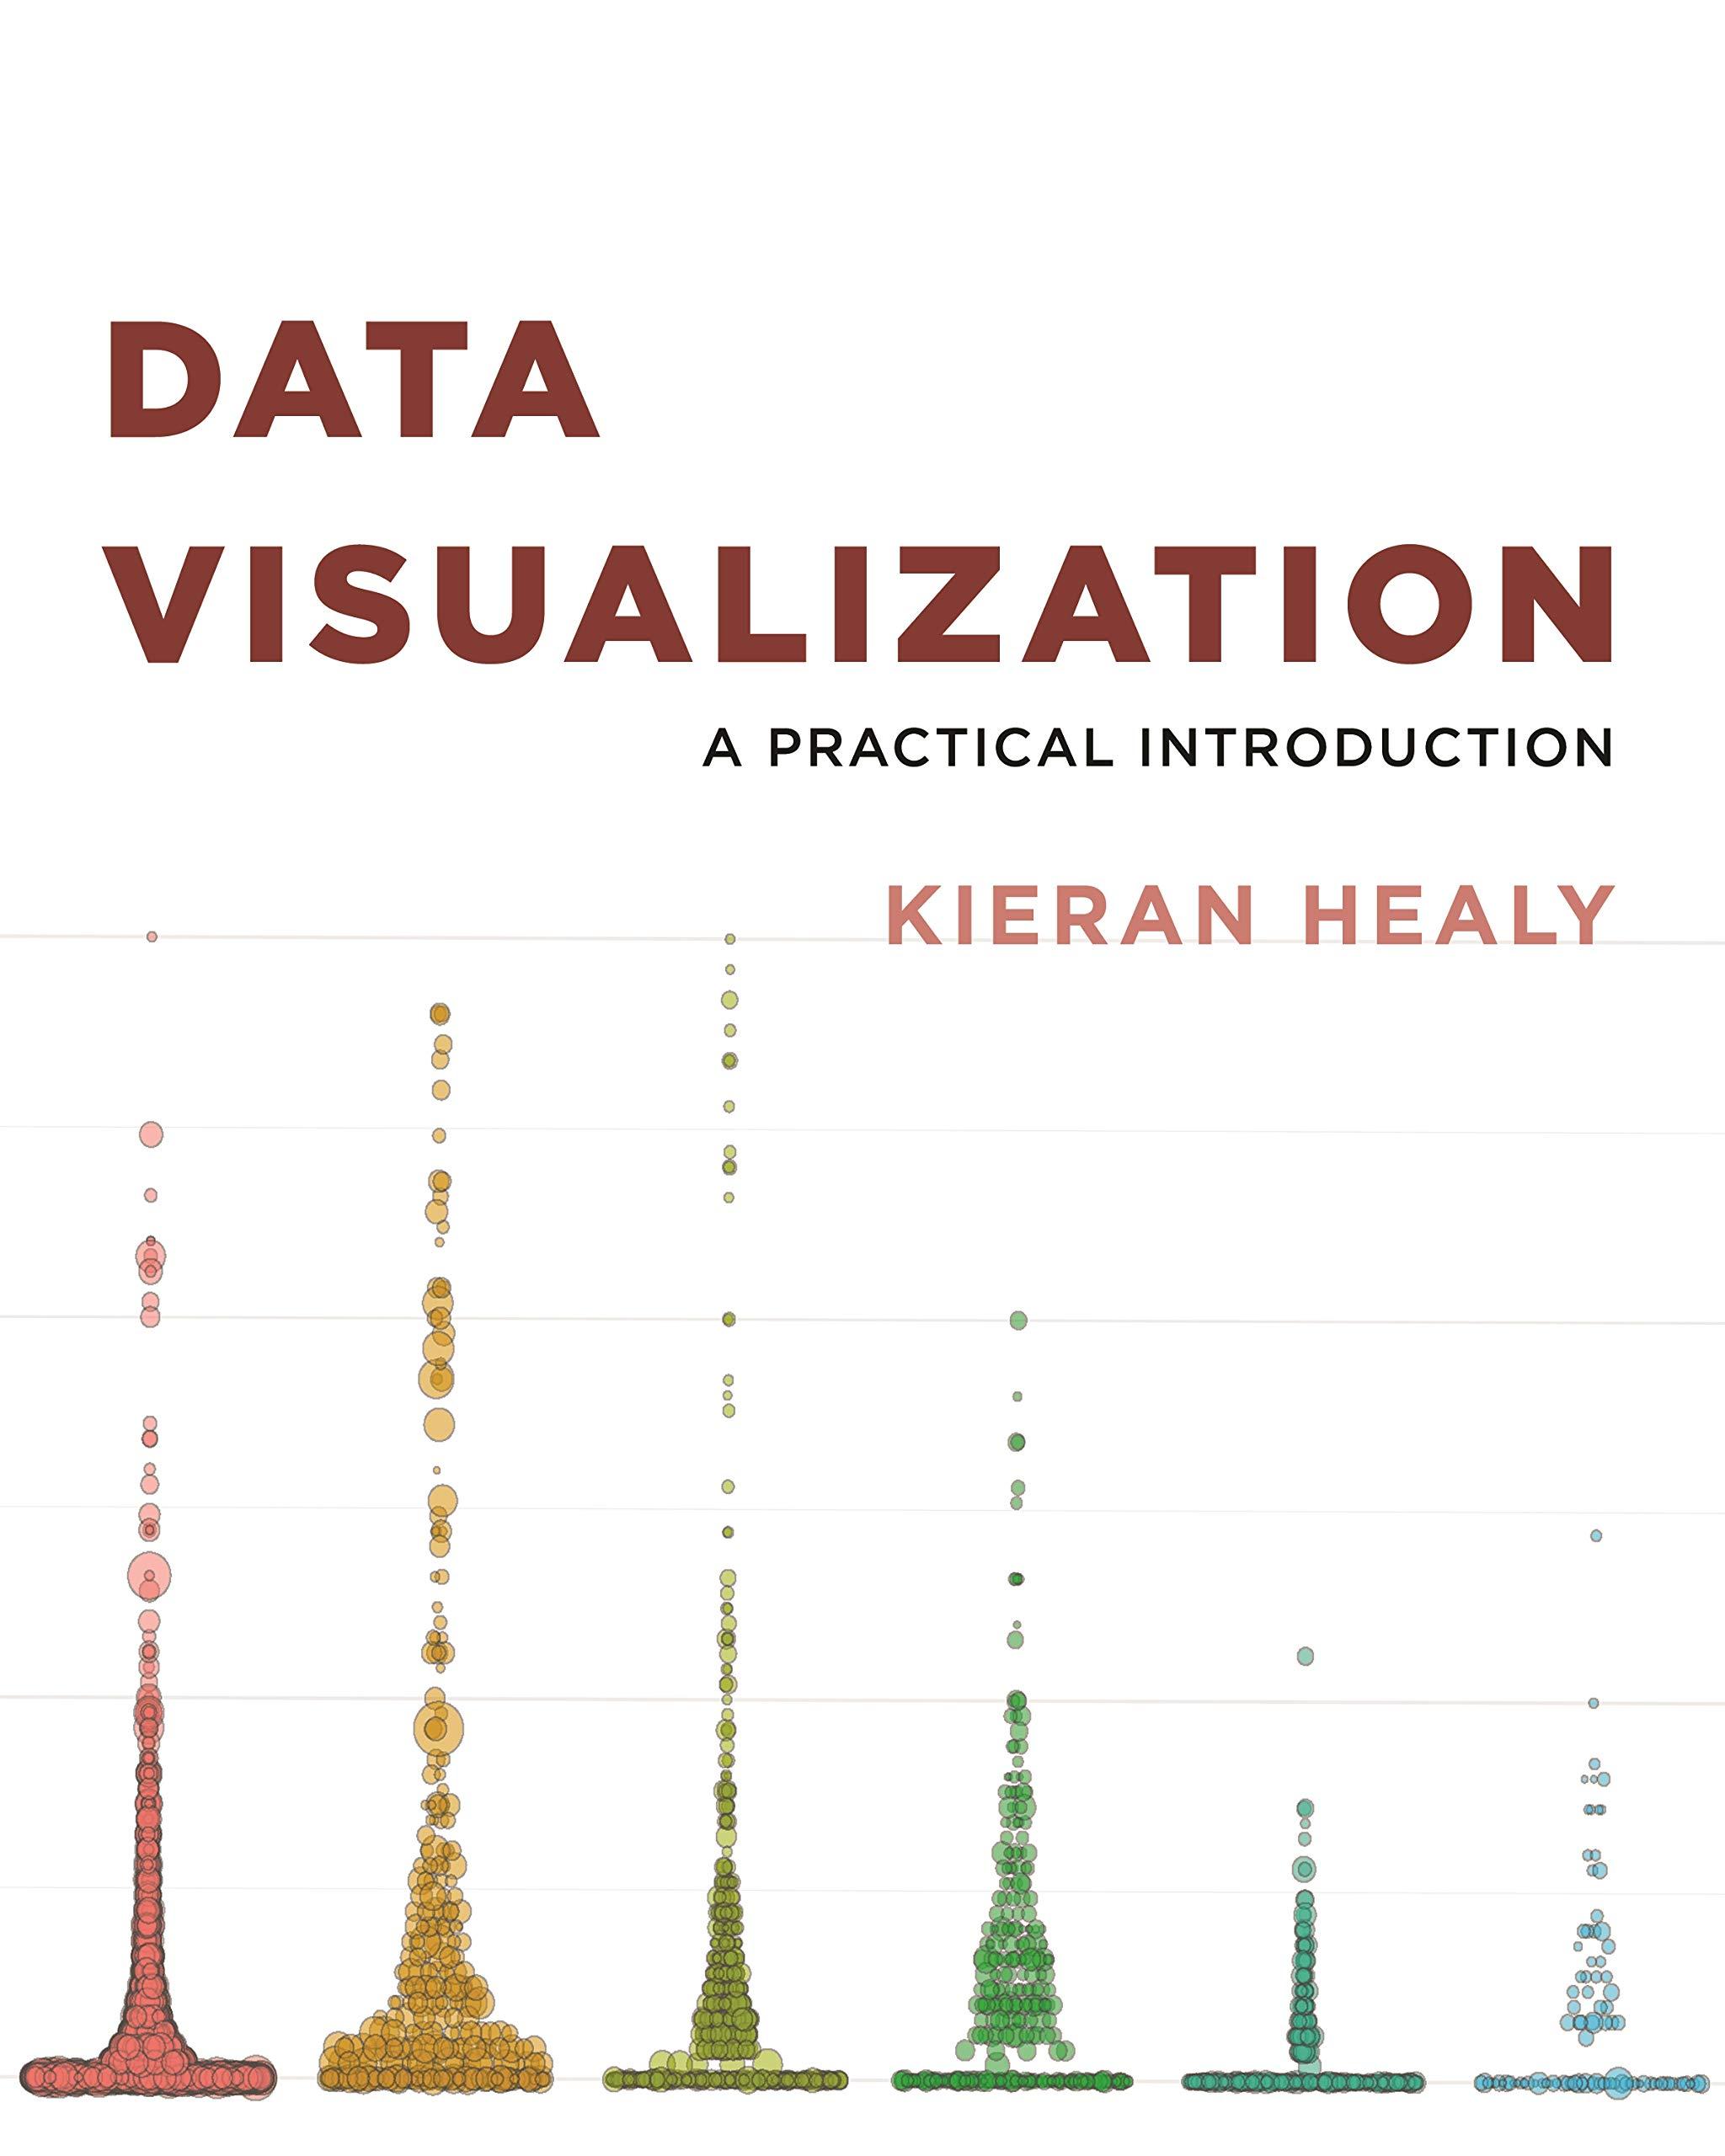 Healy, K: Data Visualization: A Practical Introduction: Amazon.es: Healy, Kieran: Libros en idiomas extranjeros